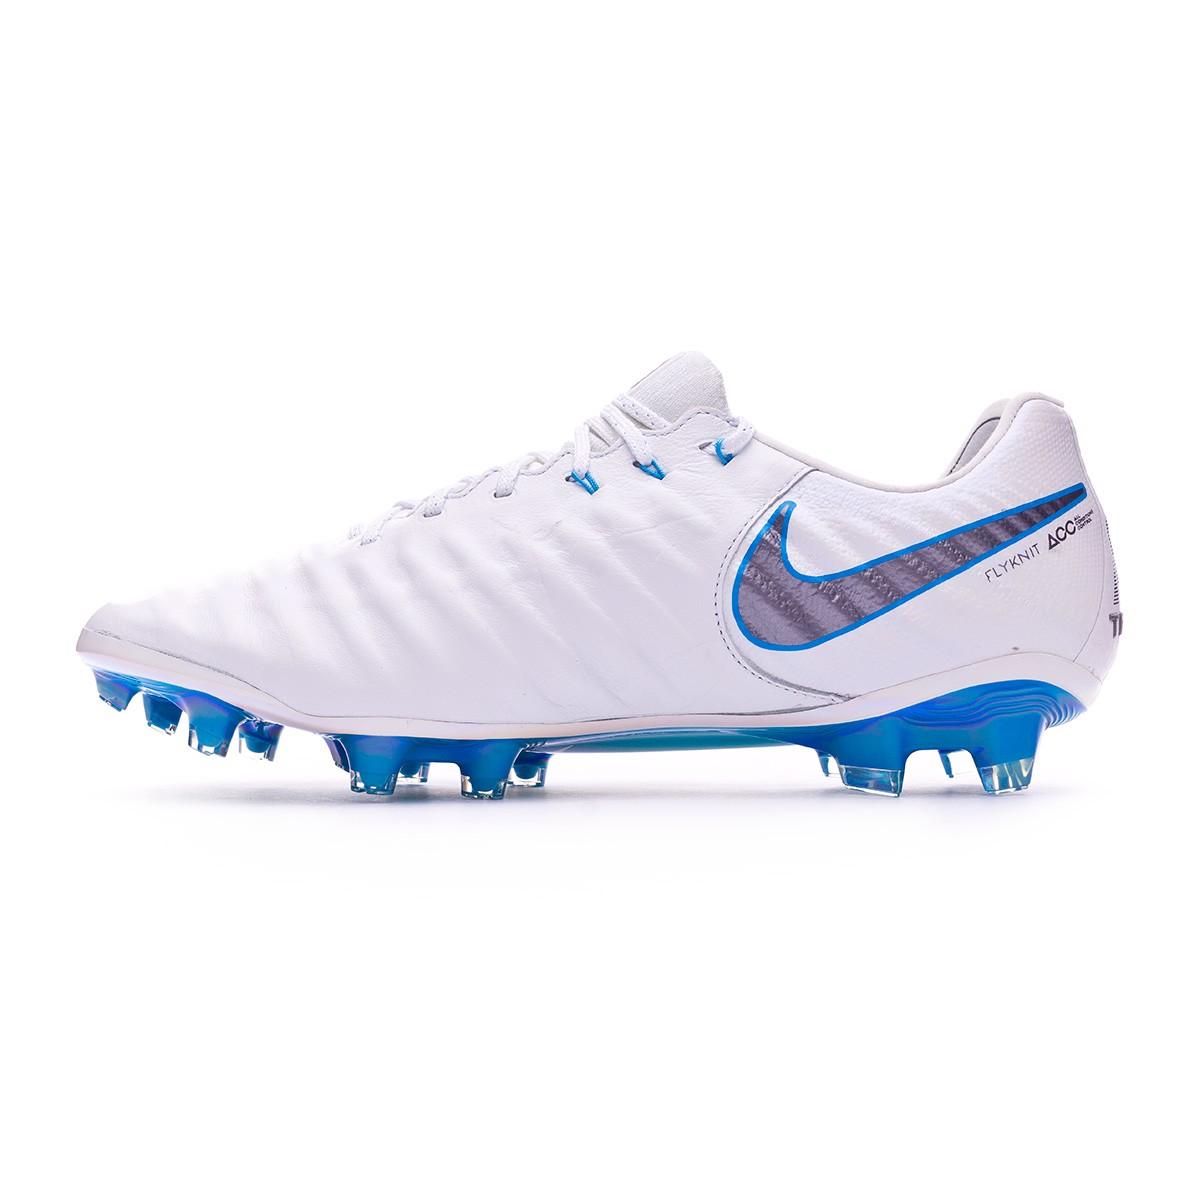 3c86326701c Football Boots Nike Tiempo Legend VII Elite FG White-Metallic cool  grey-Blue hero - Football store Fútbol Emotion